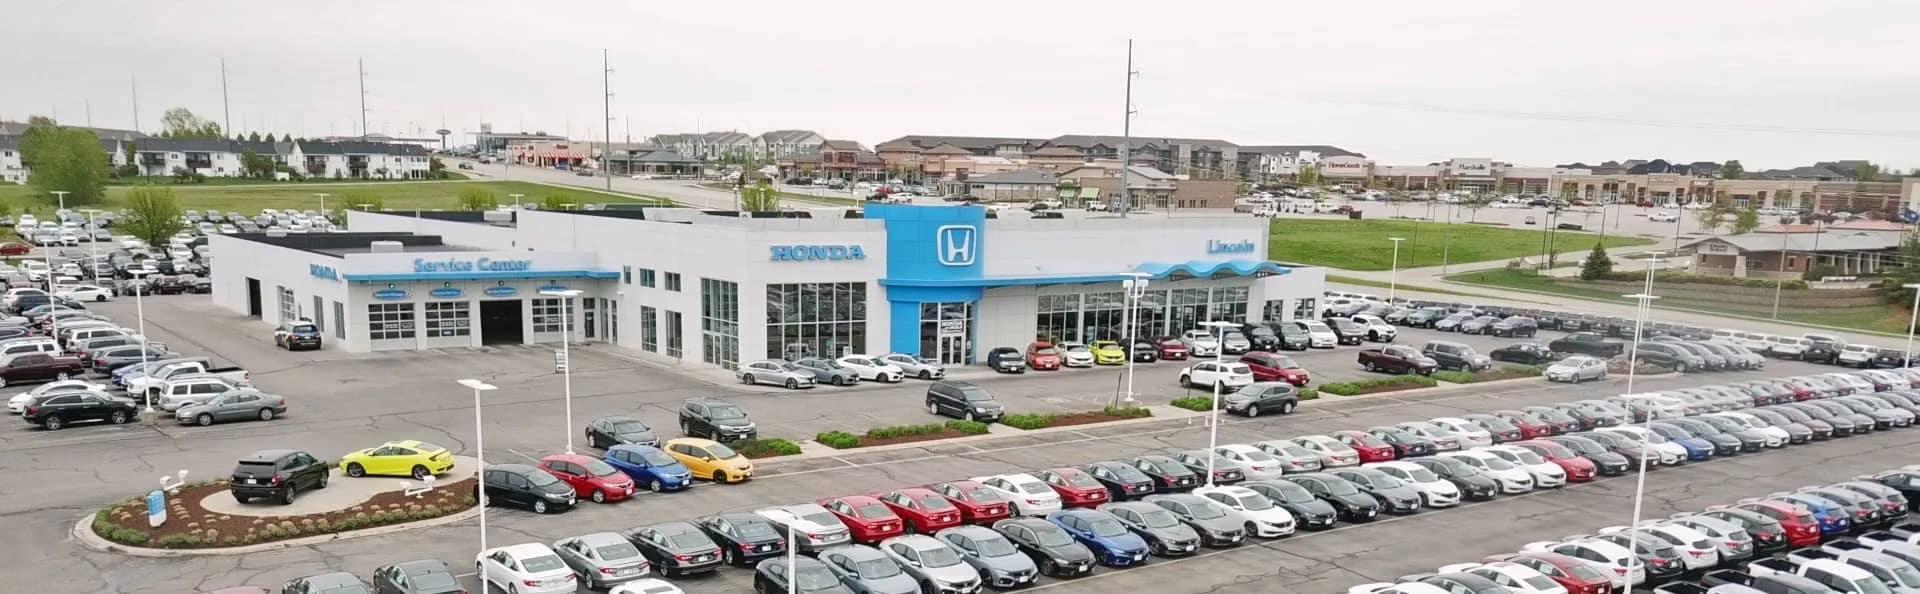 Honda of Lincoln Dealership Exterior photo